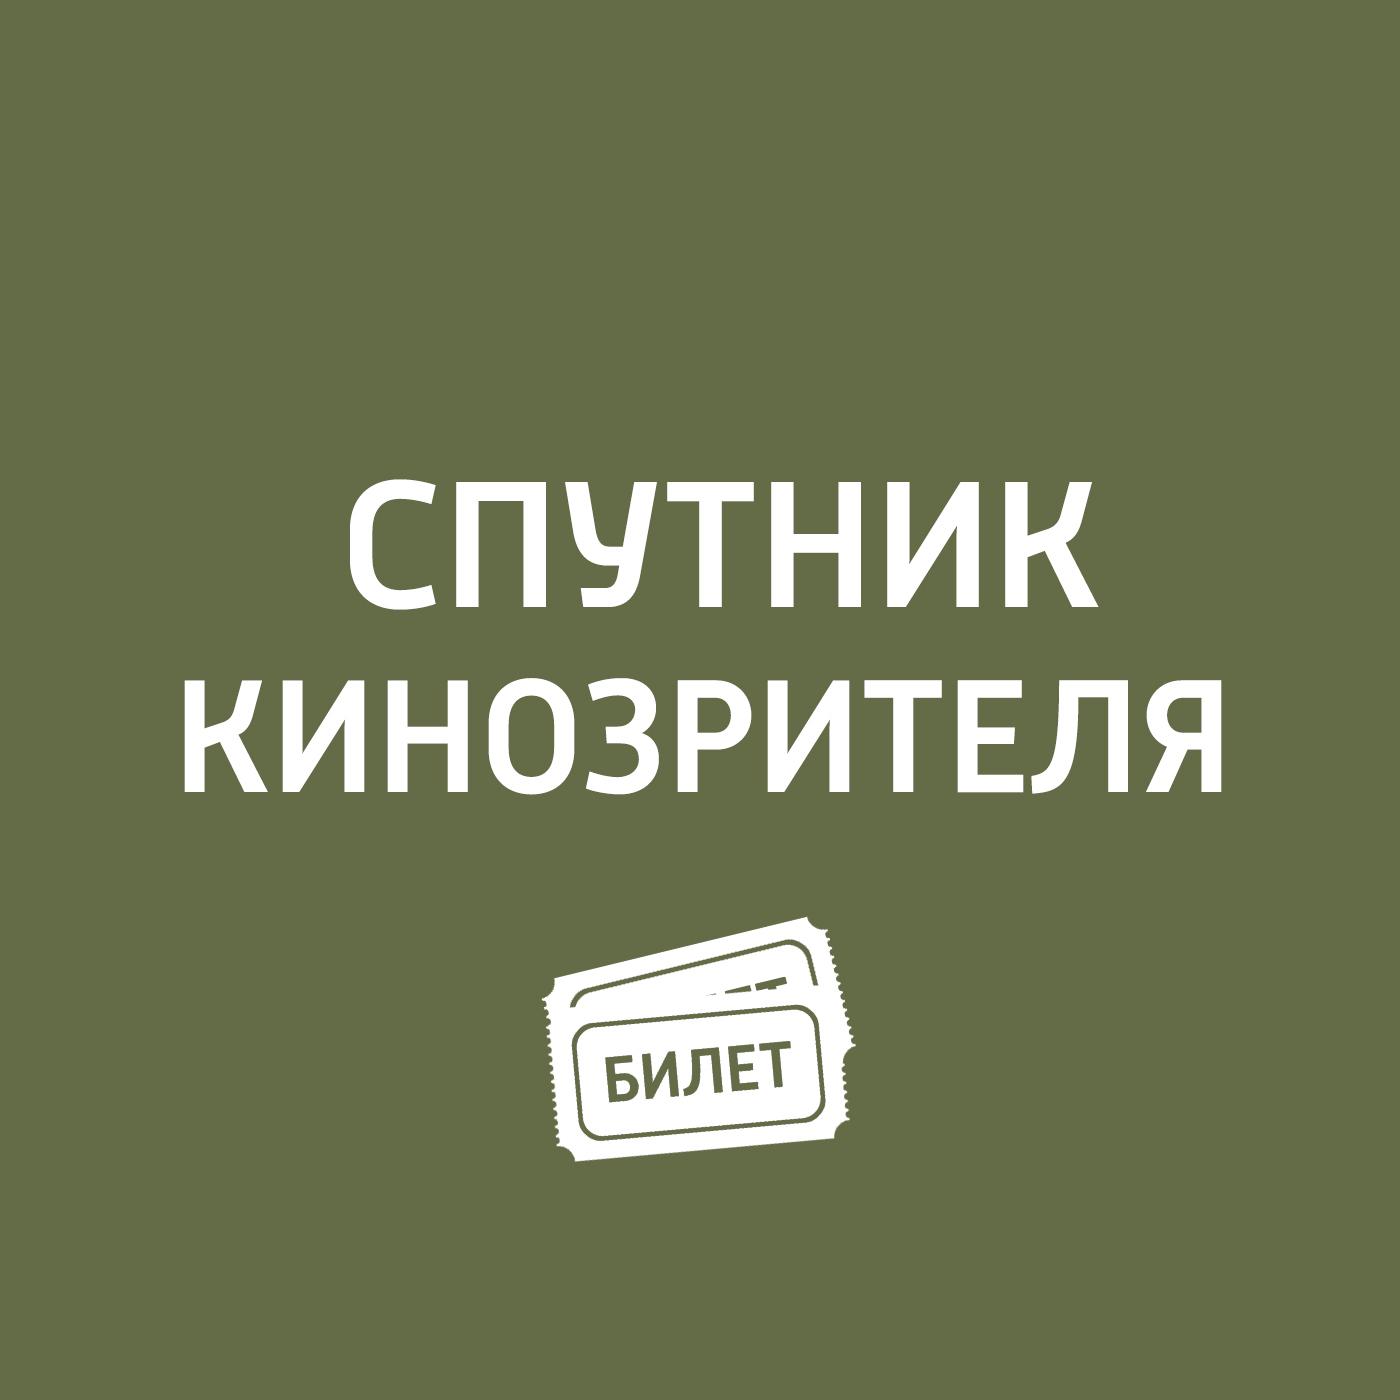 Антон Долин Неудержимые-3, «Красотки Парижа ads7805p ads7805 dip dac page href